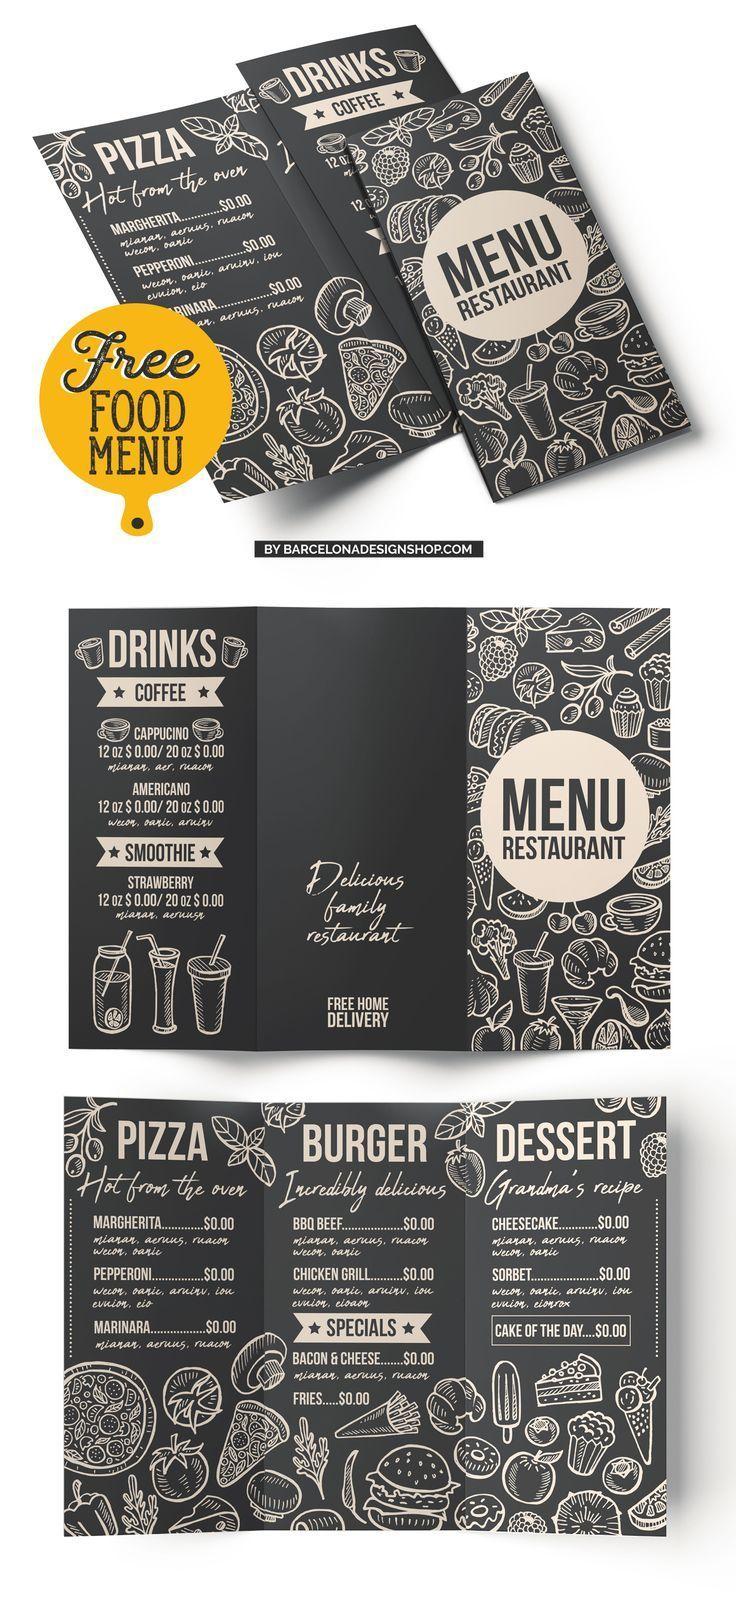 Free food menu template for restaurant. Photoshop psd burger pizza ...